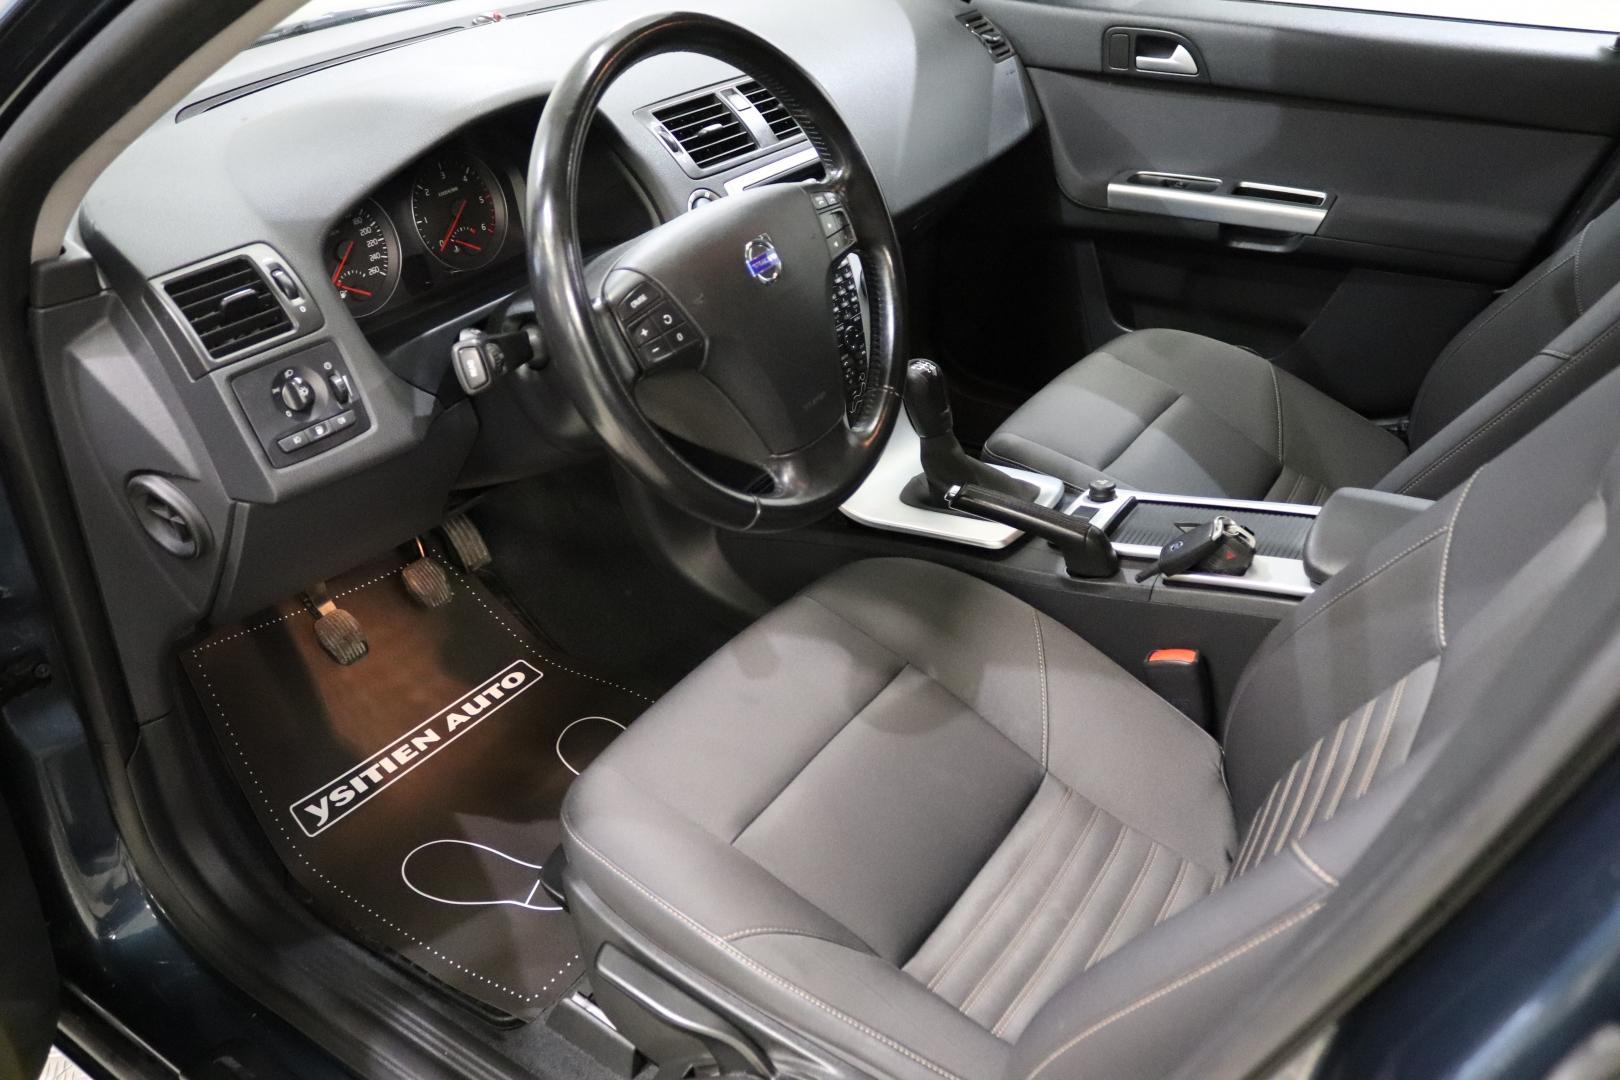 Volvo V50, 1,6D DRIVe S/S Classic